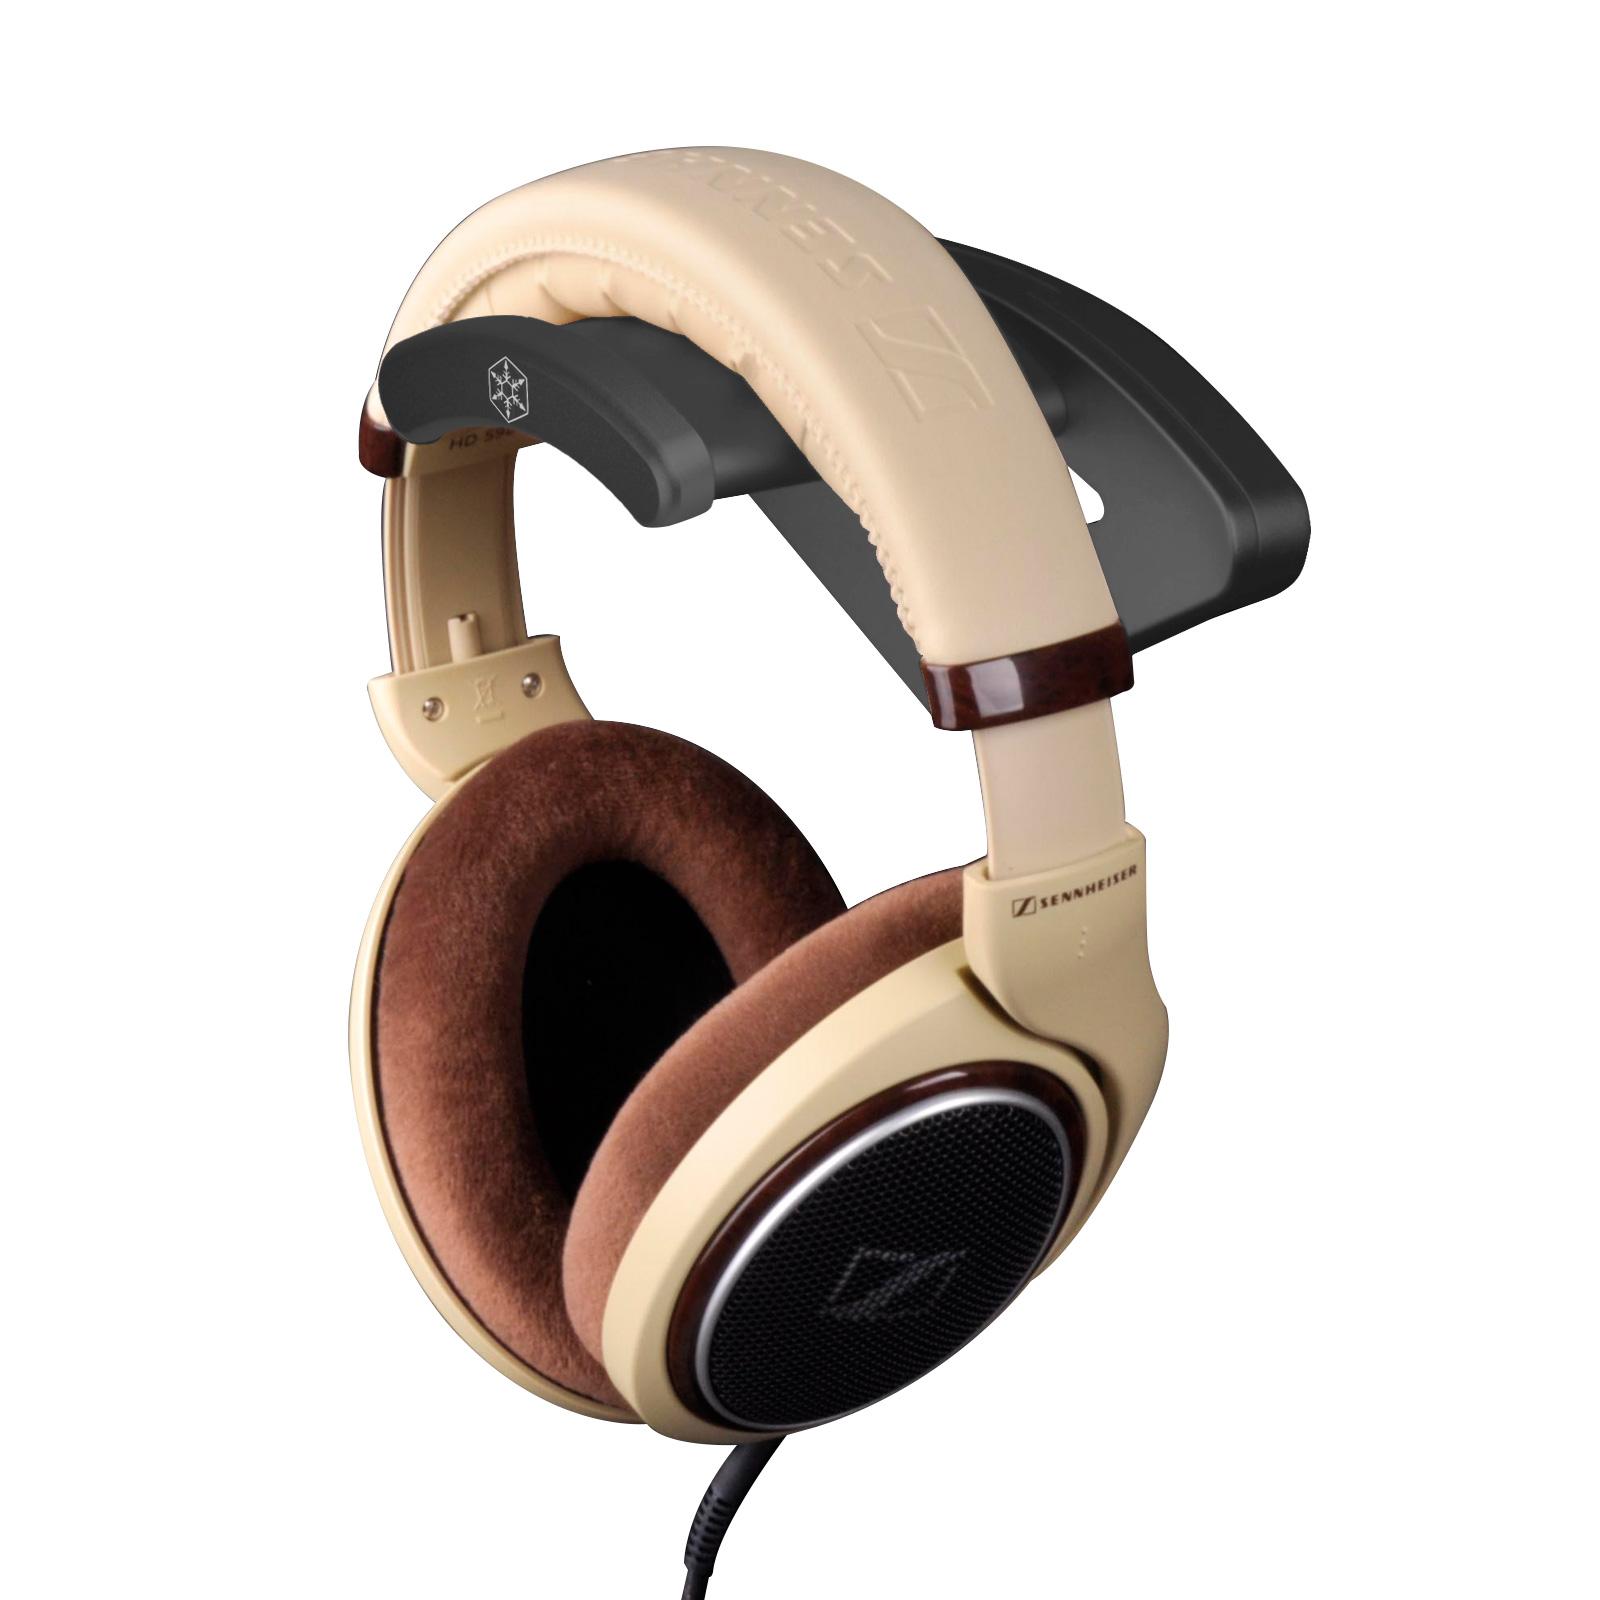 Fnatic gear rush - Wall mount headphone holder ...